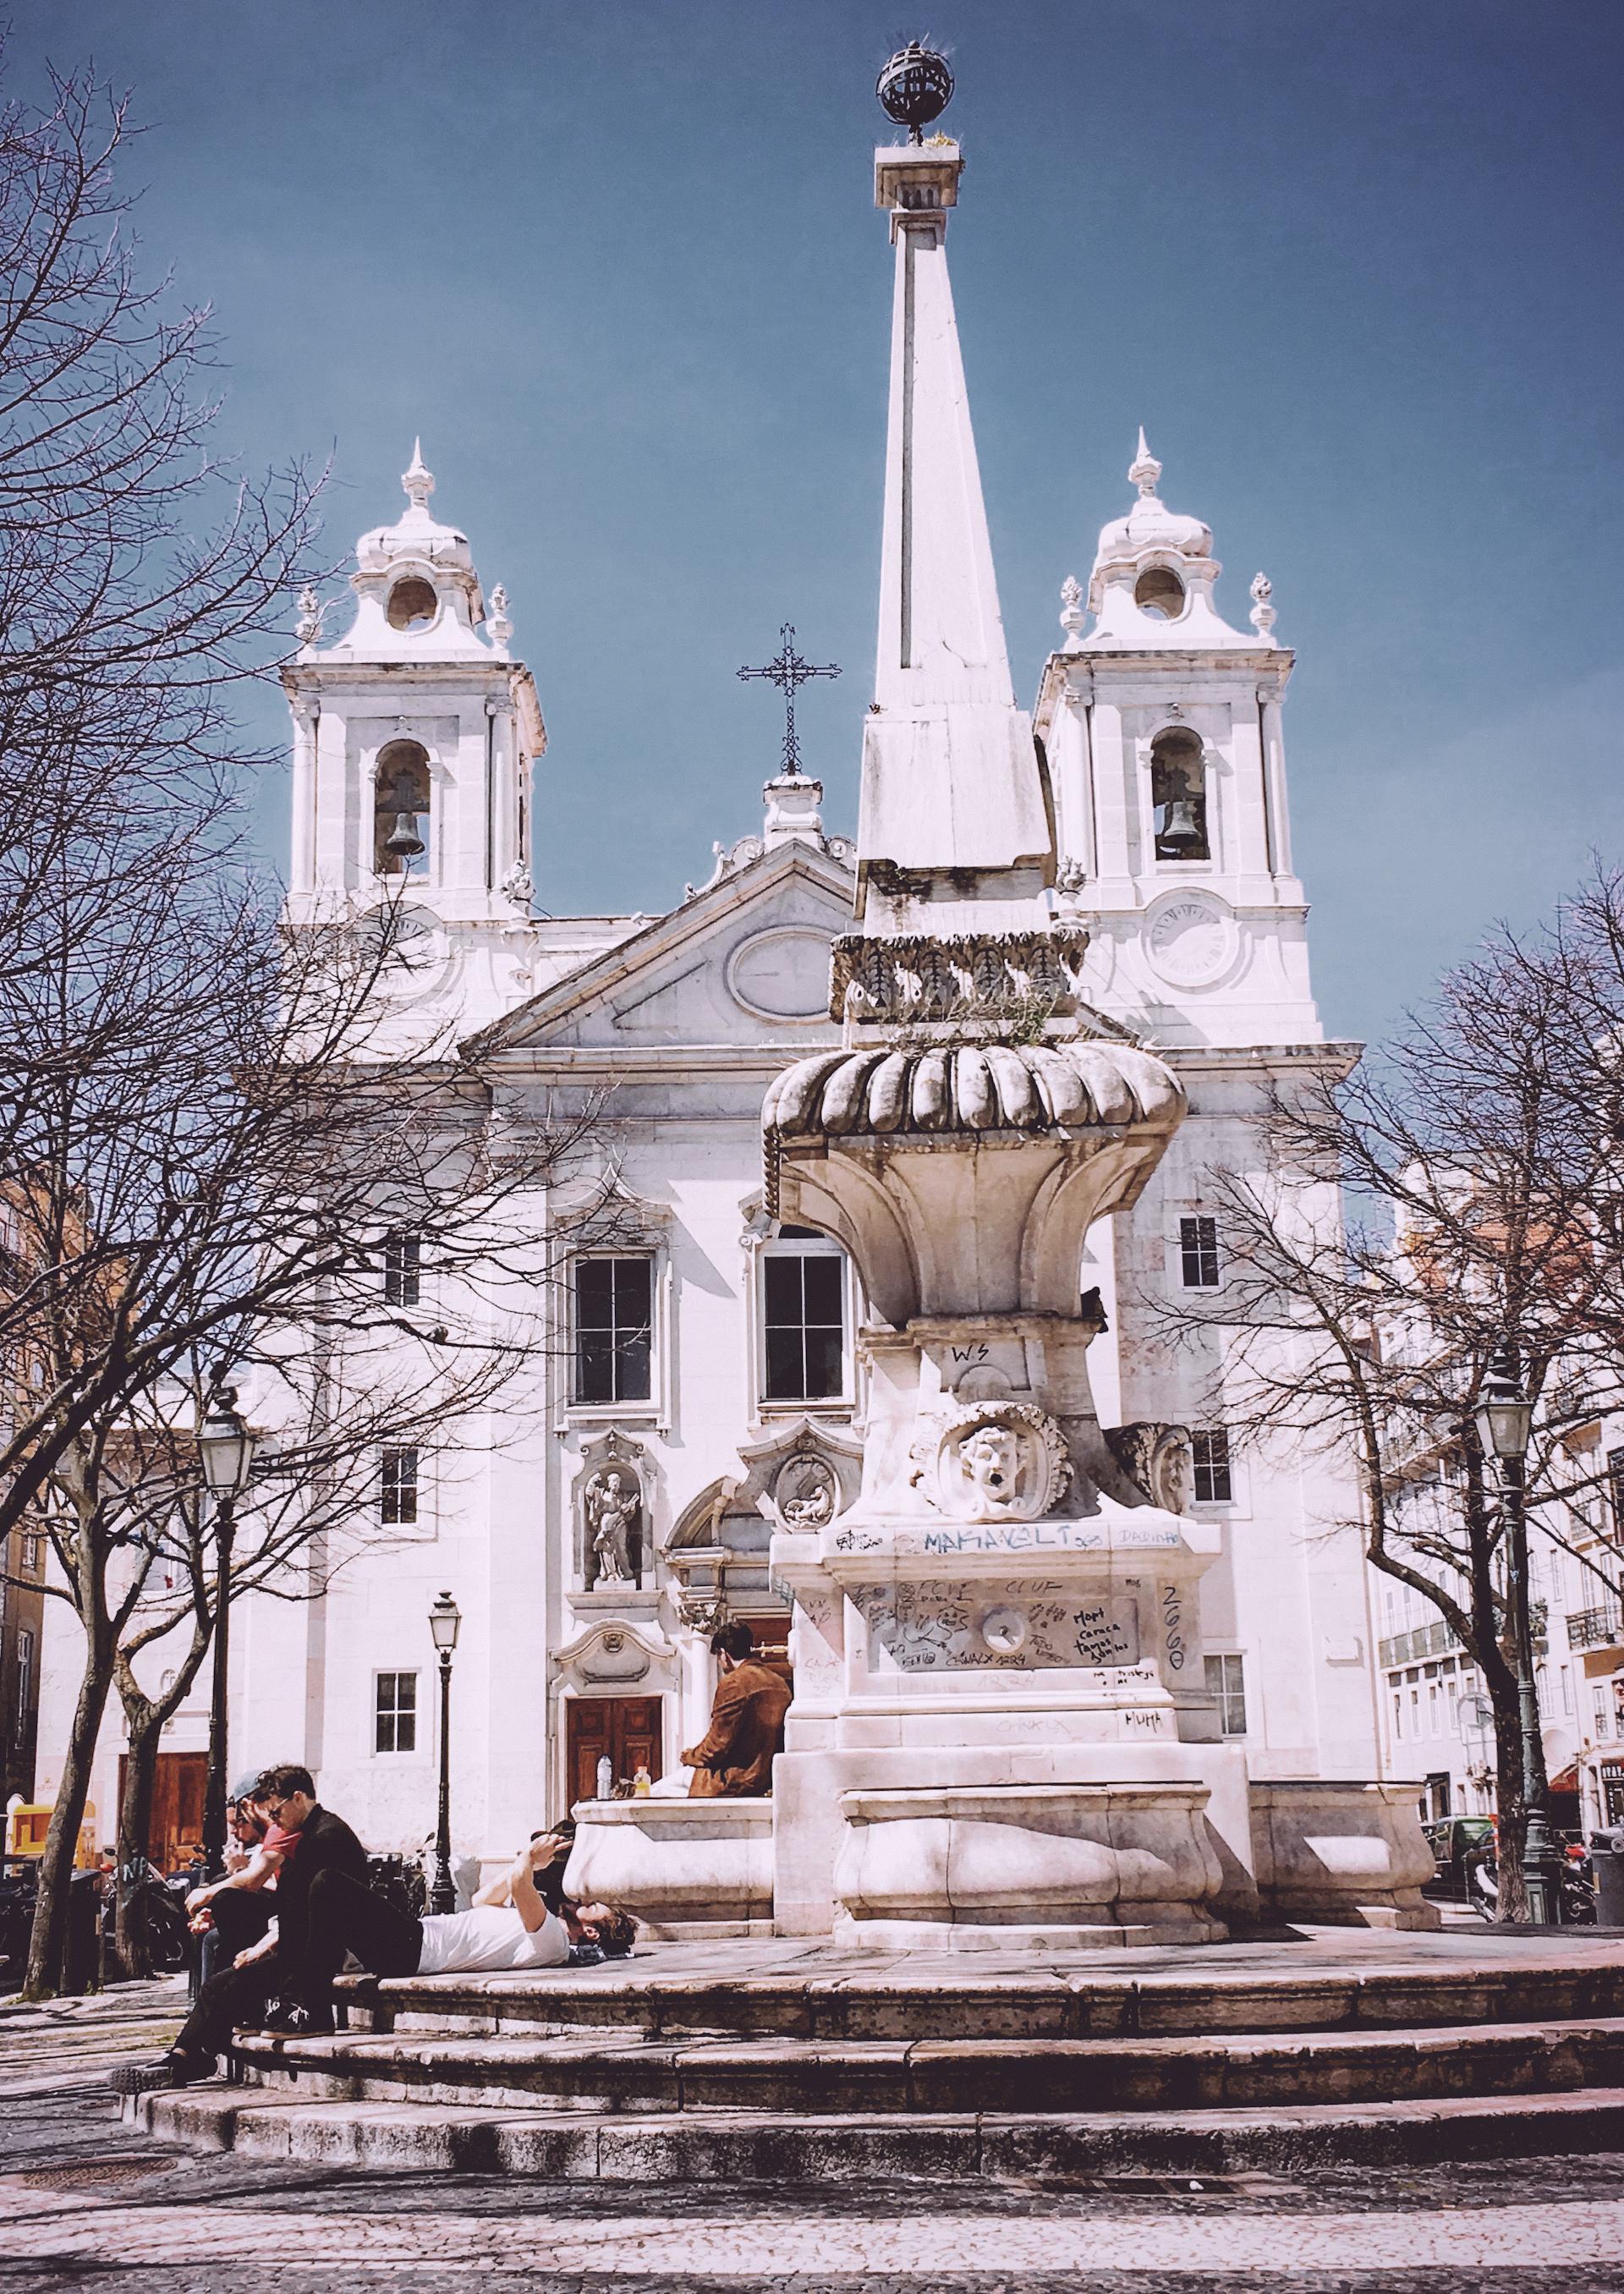 Lisbon in March